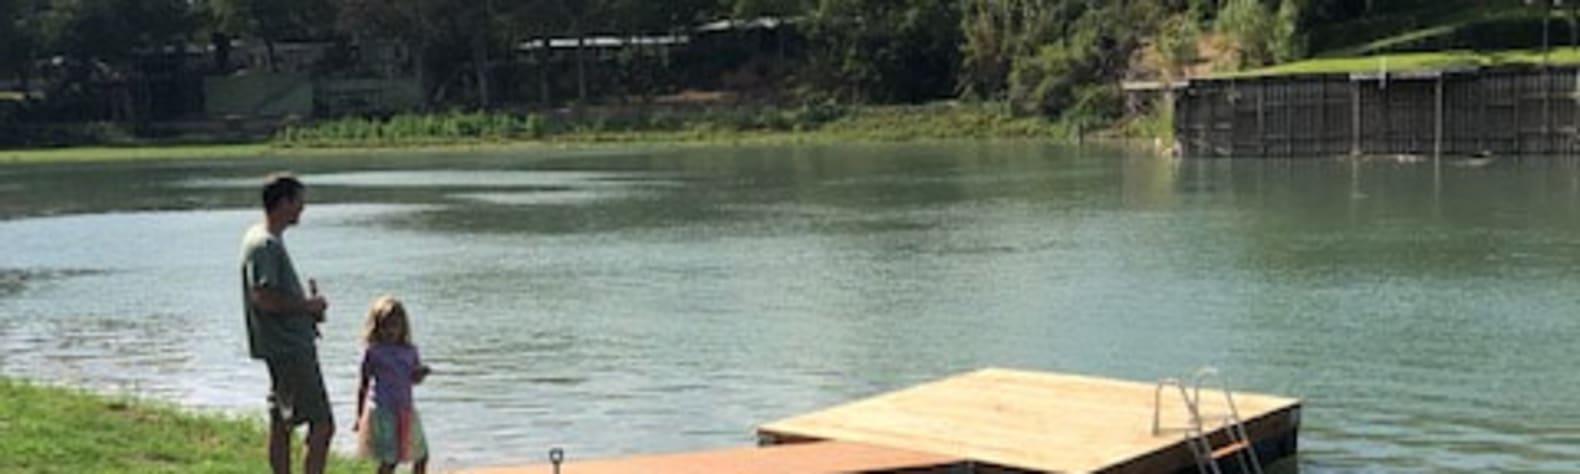 Riverfront Access Fun Amenities